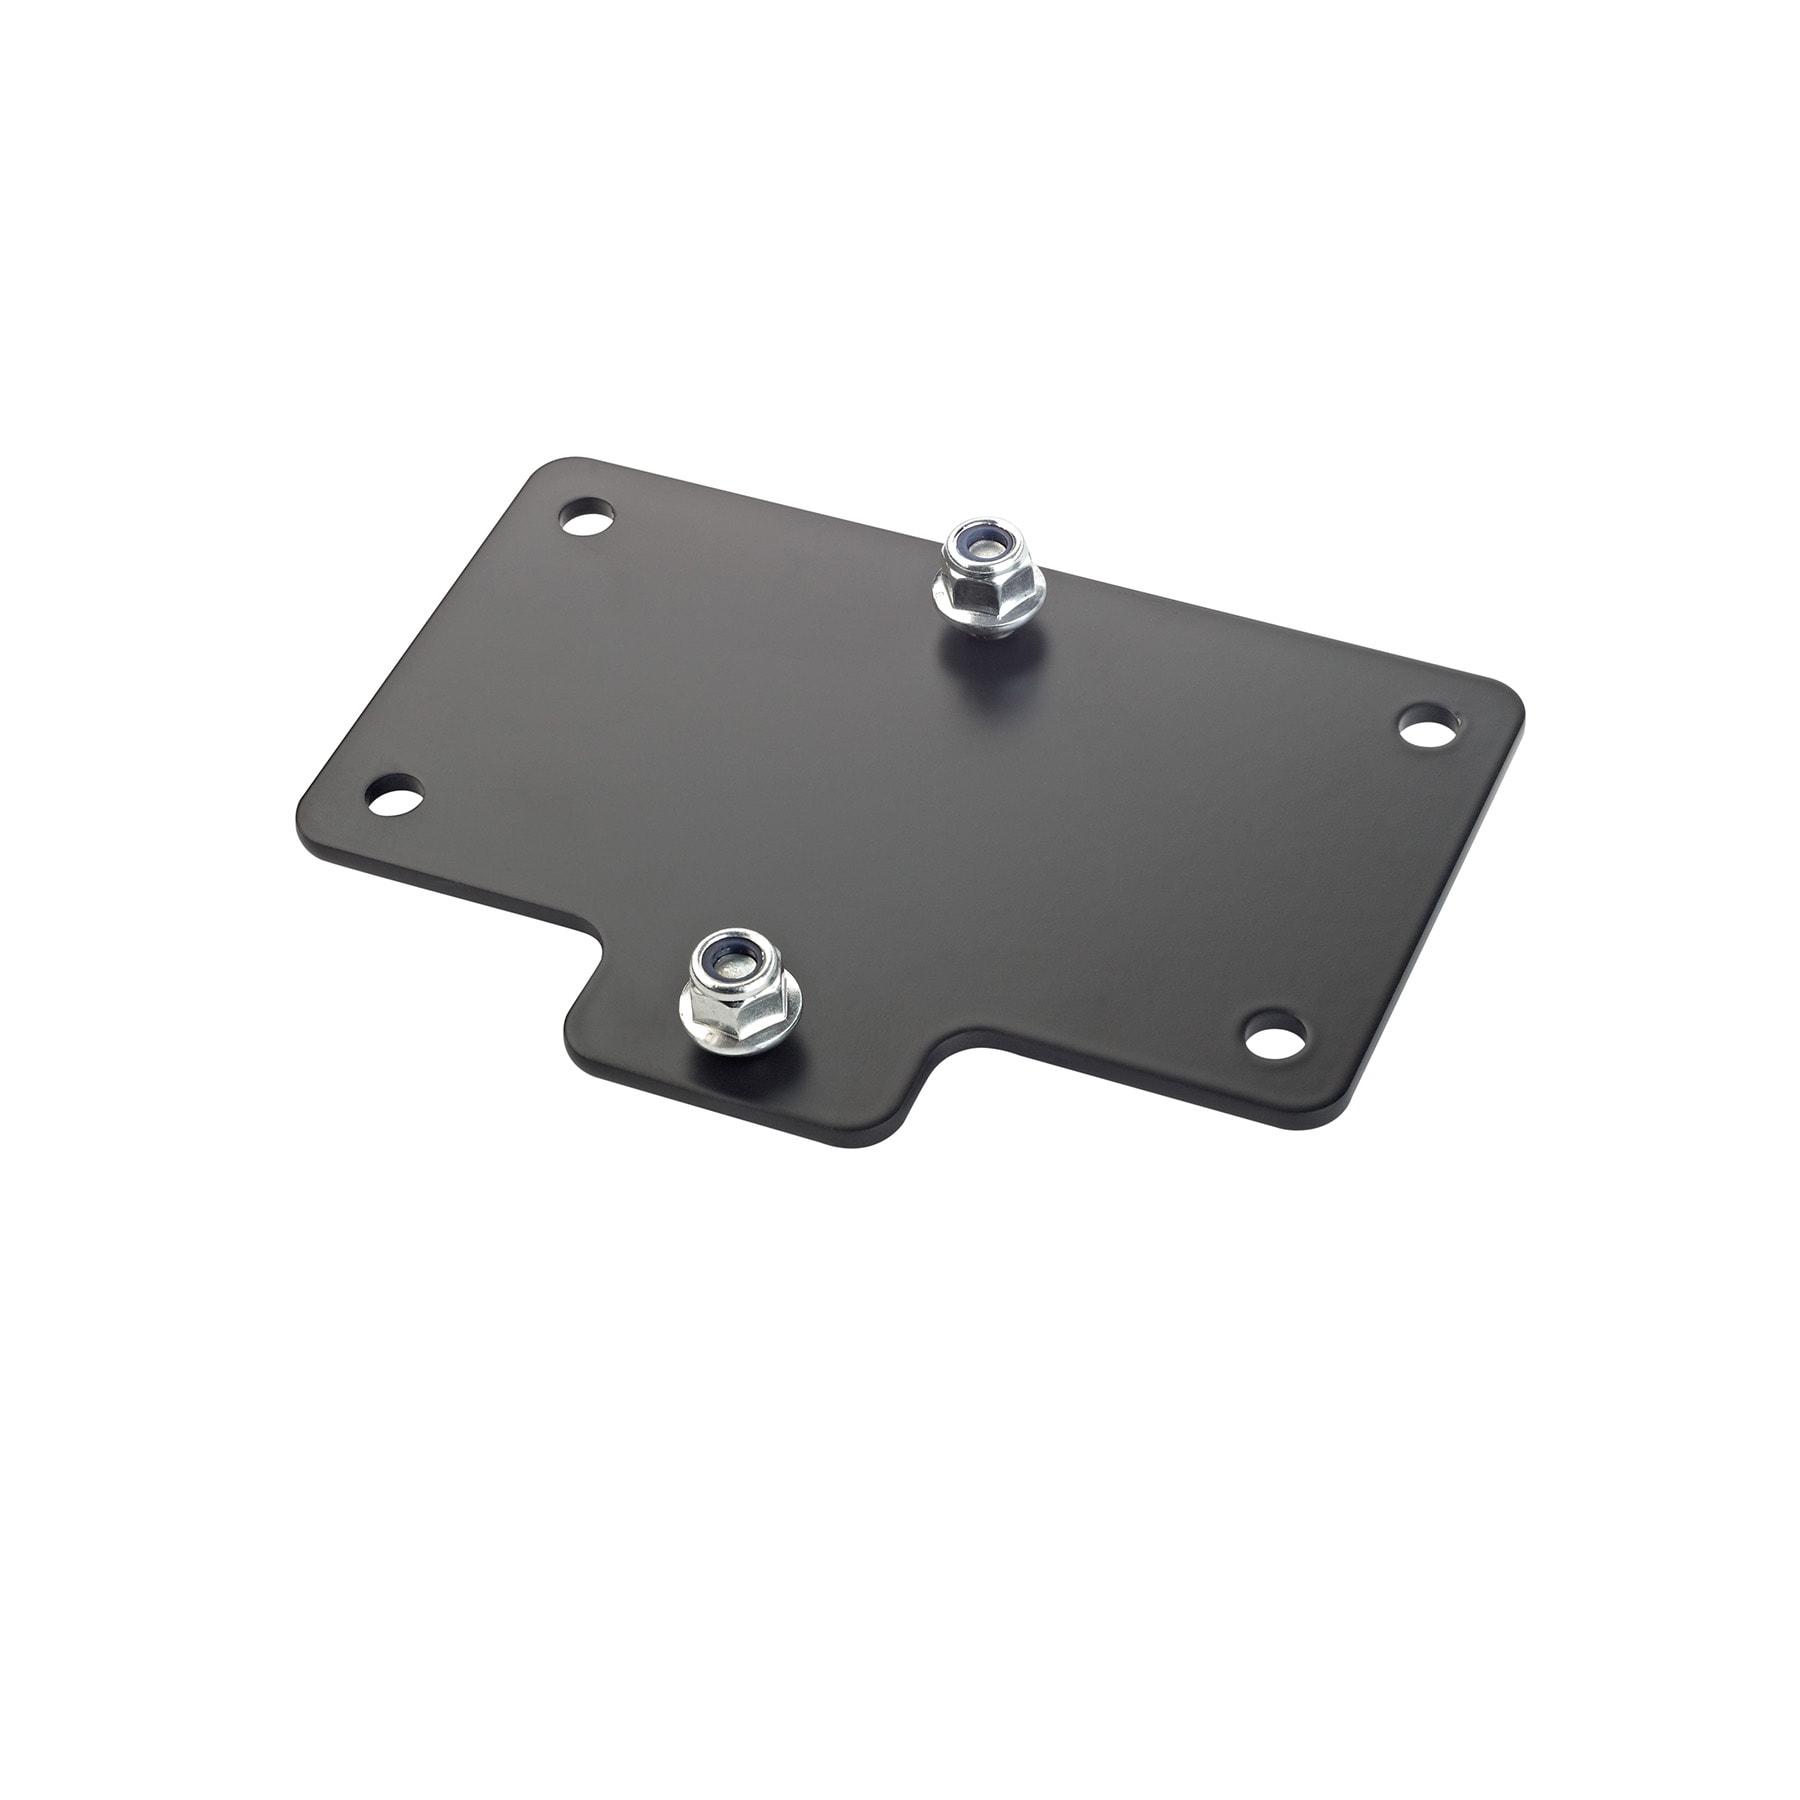 KM24357 - Adapter panel 4